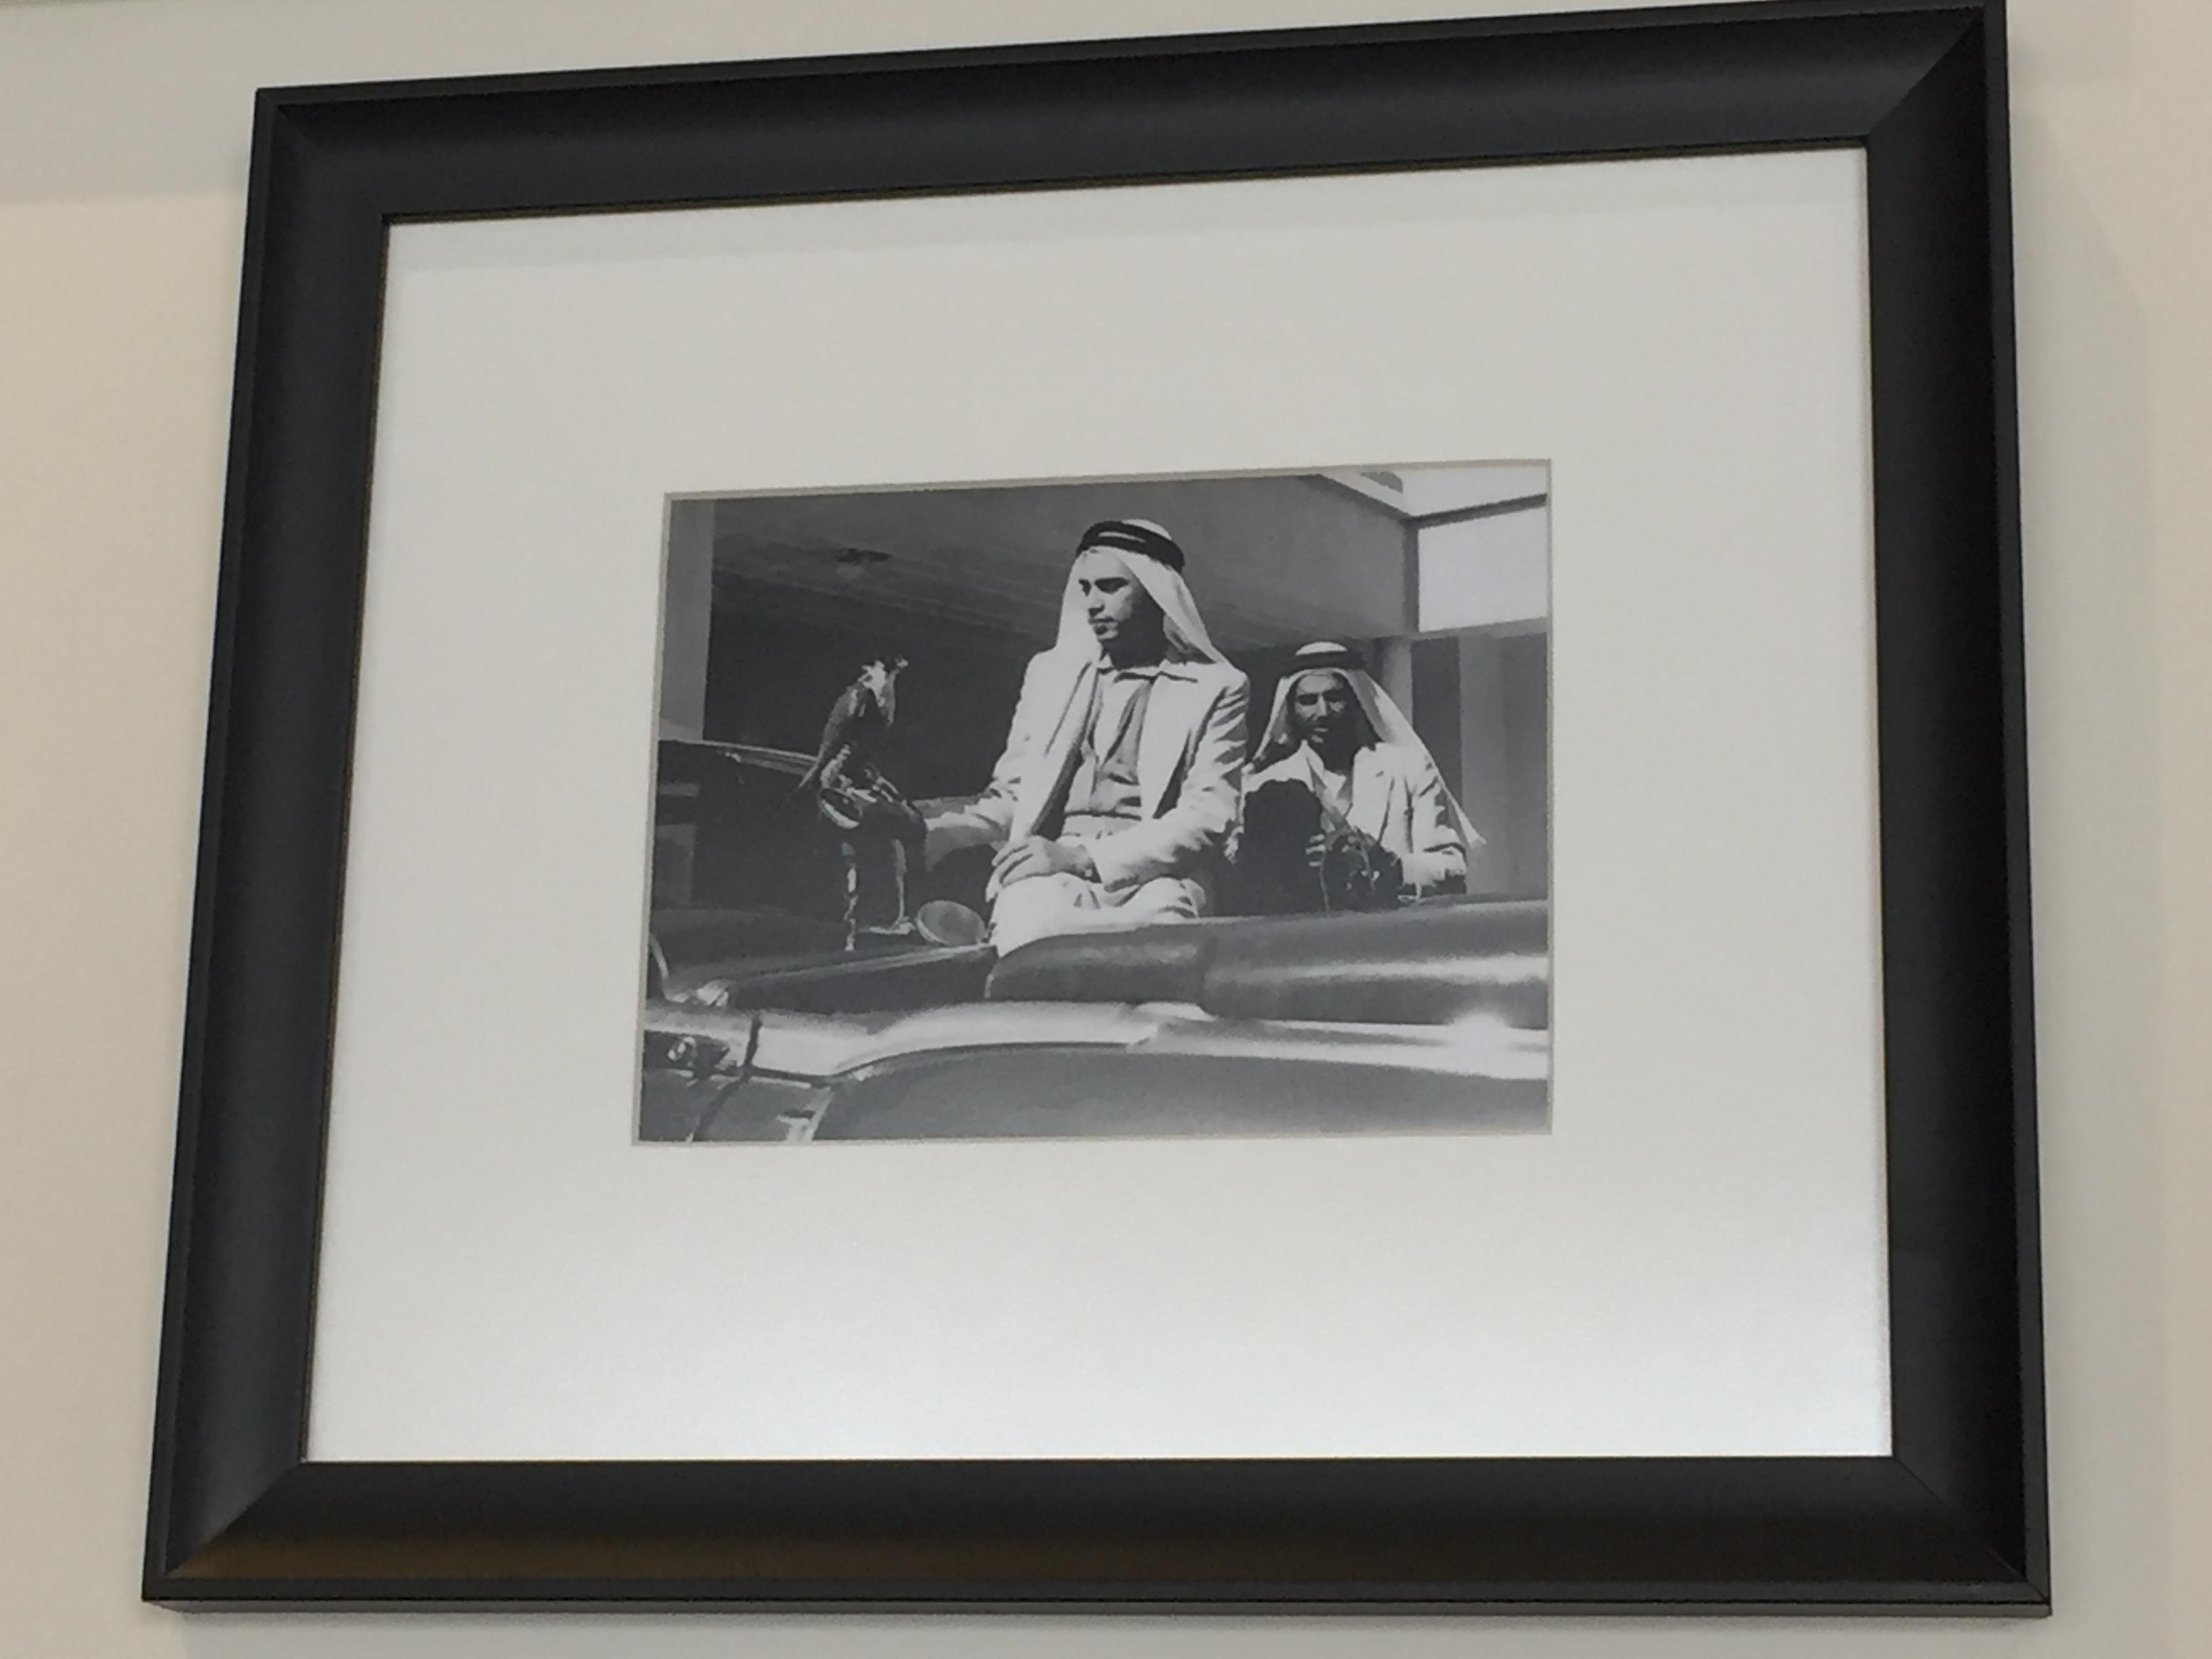 Al Khor, Qatar - Al-Fardan Private Luxury Car Collection - Family Memories